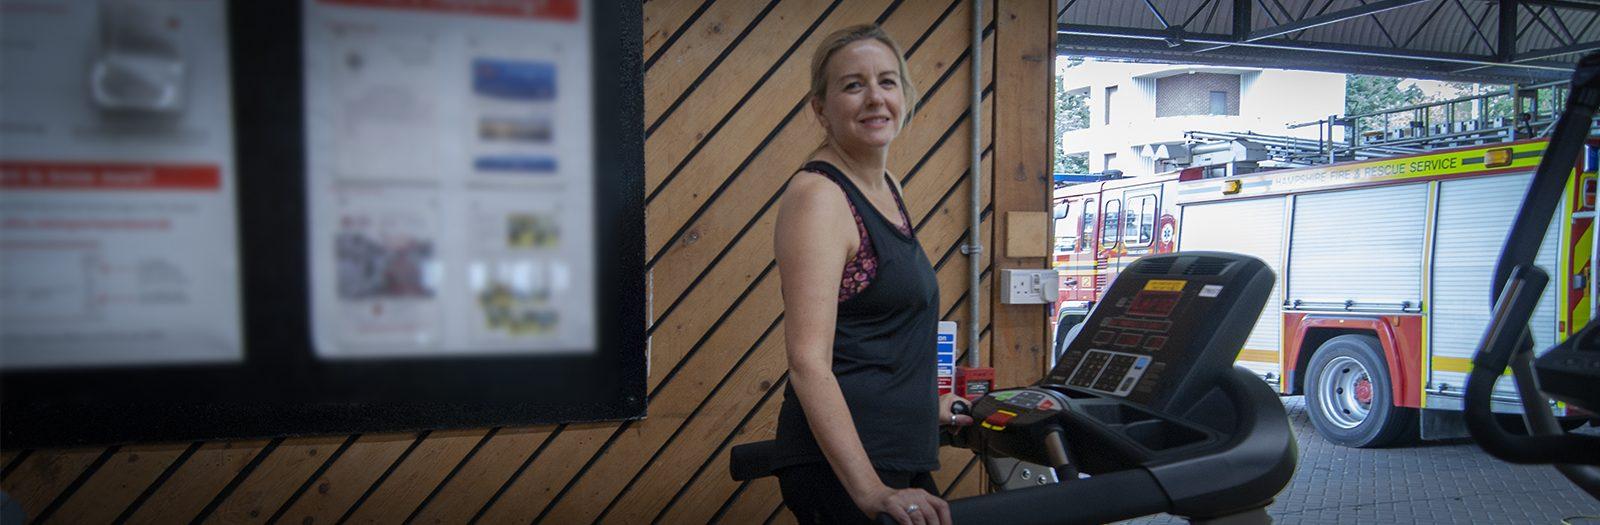 Jenna Shergold will take part in the Treadmill Challenge